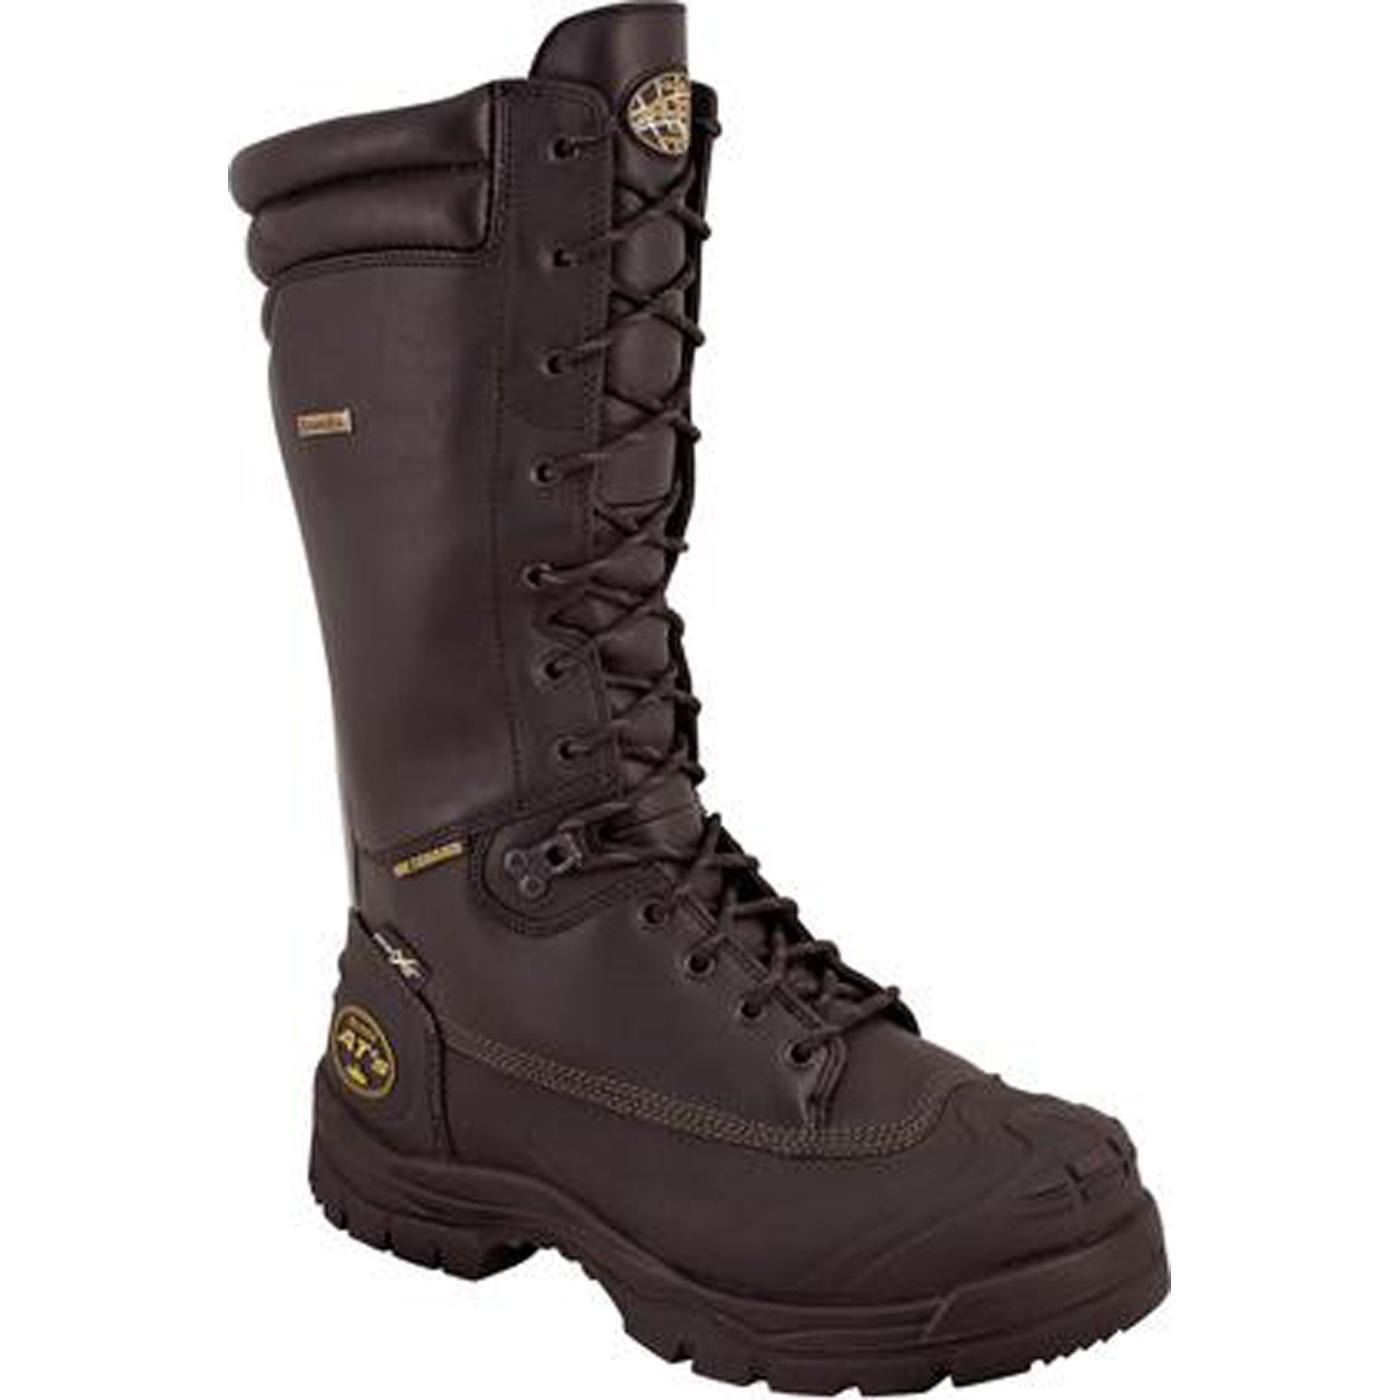 Oliver Steel Toe Puncture Resistant Metatarsal Mining Boot